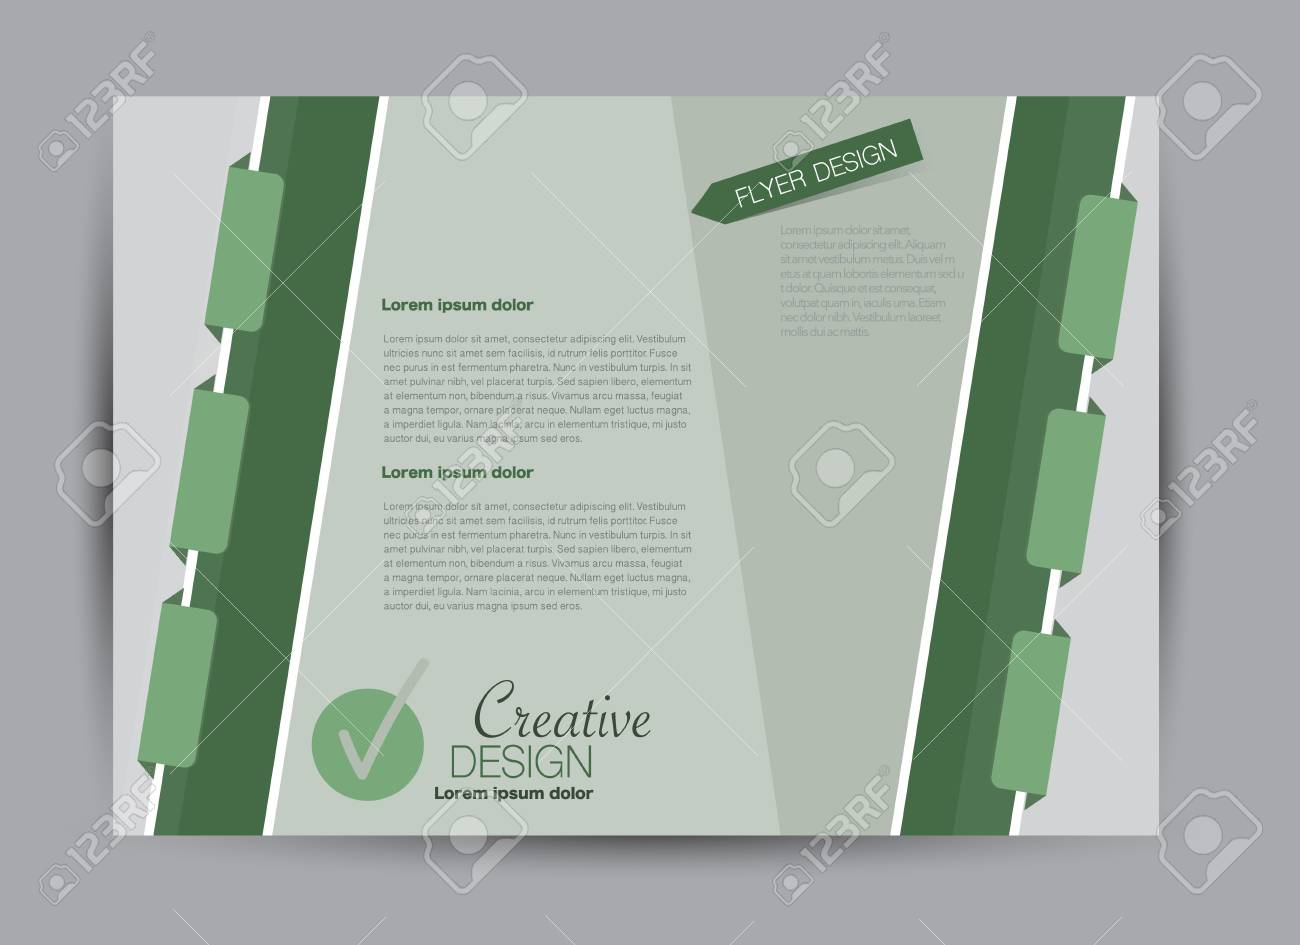 Flyer, Brochure, Billboard Template Design Landscape Orientation ...